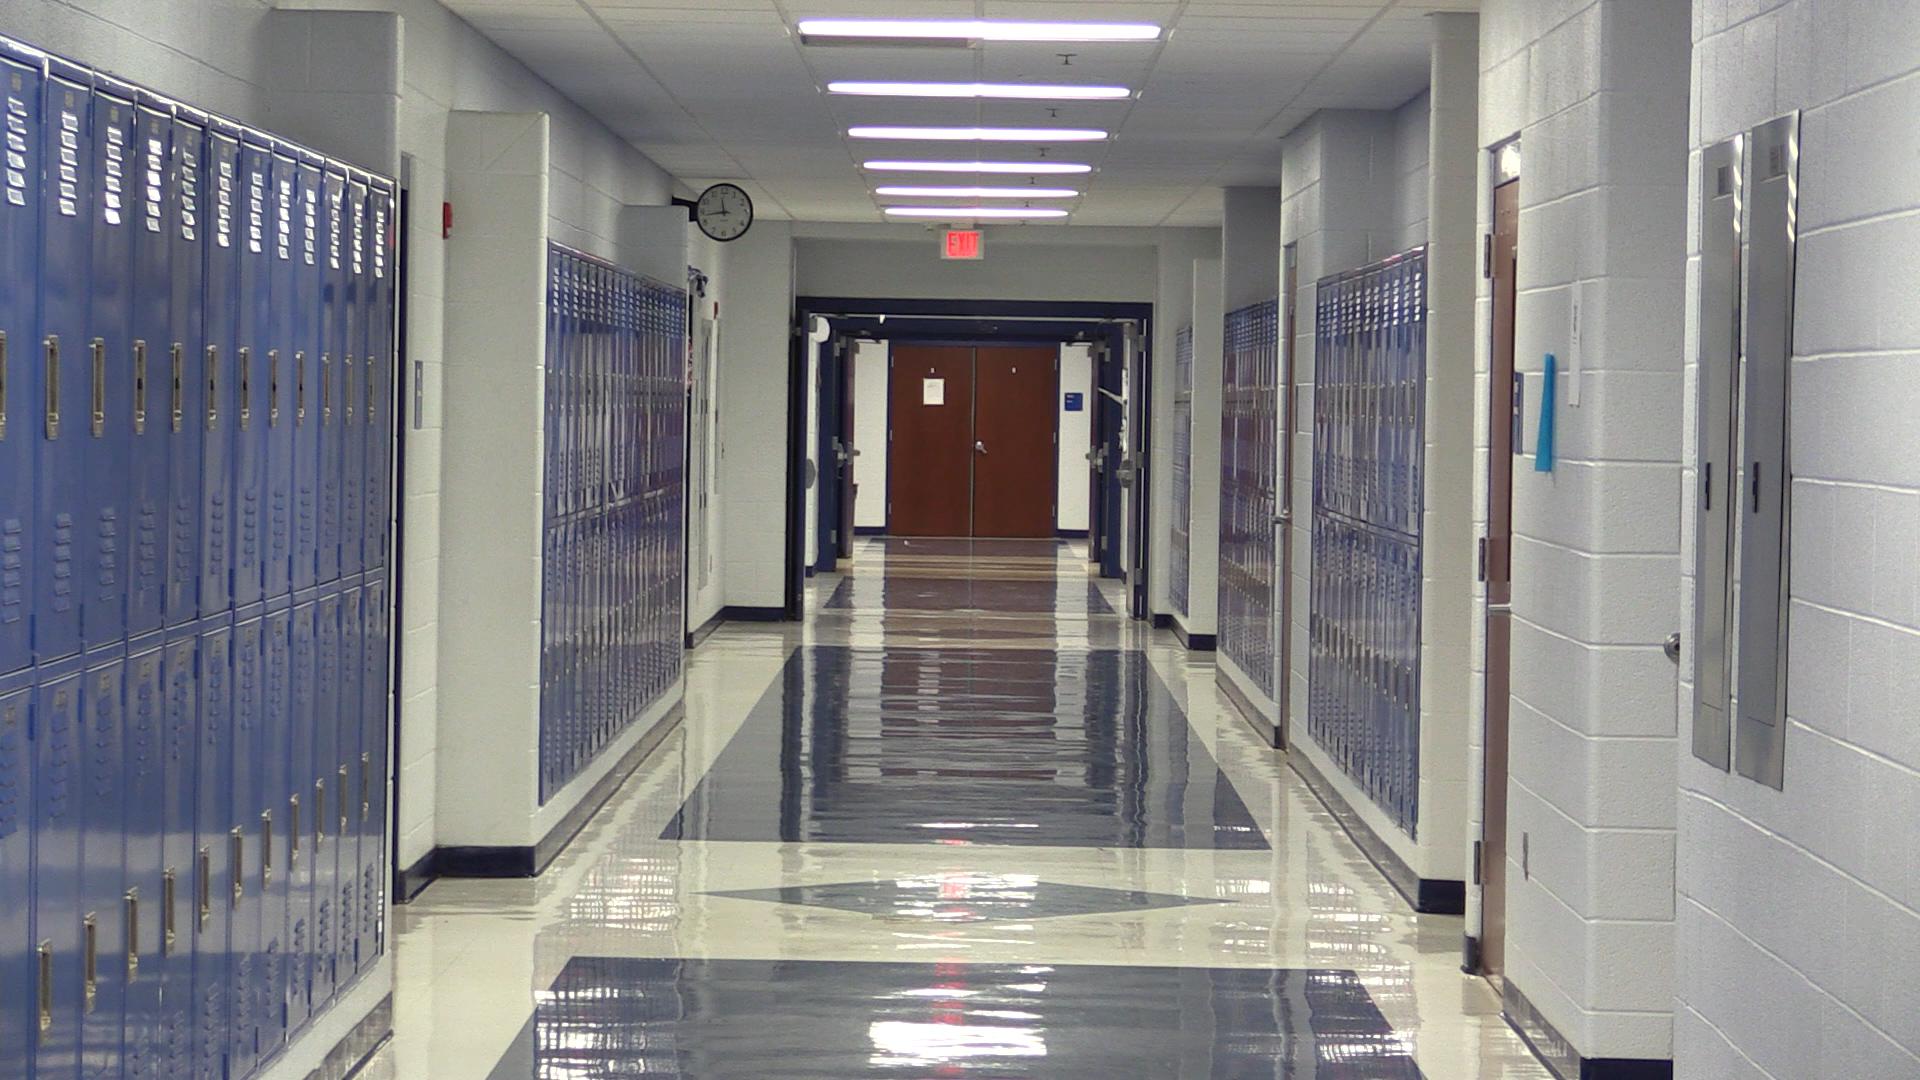 Letcher school district reports COVID case